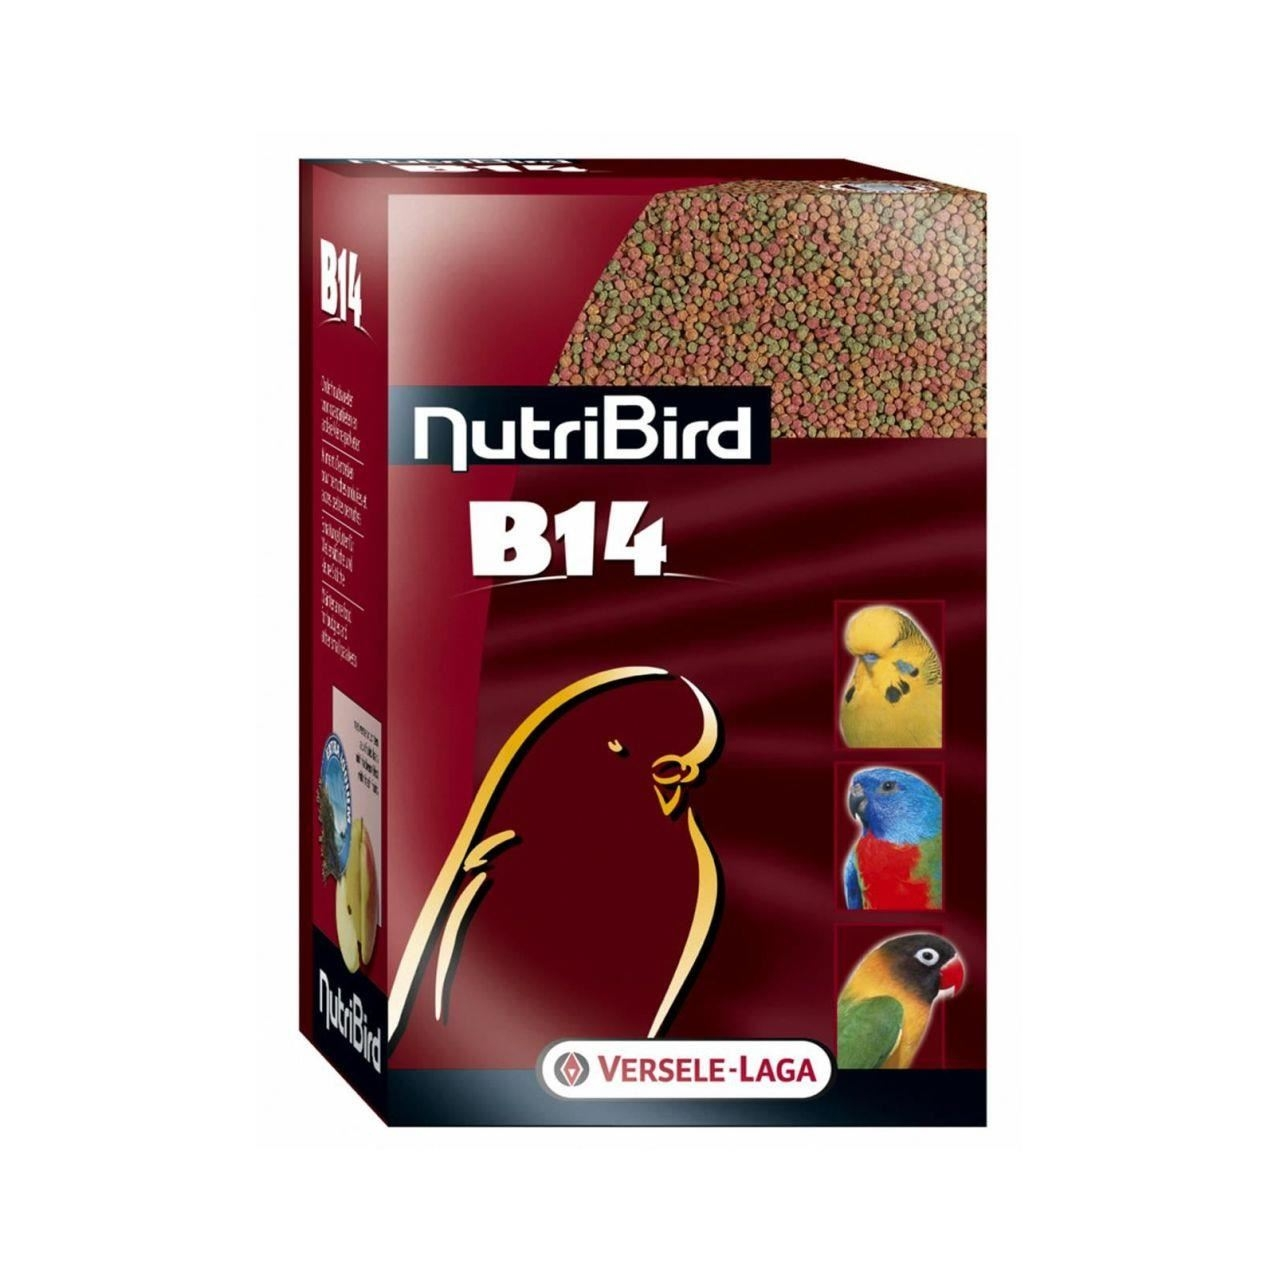 NutriBird B14, 4 kg imagine